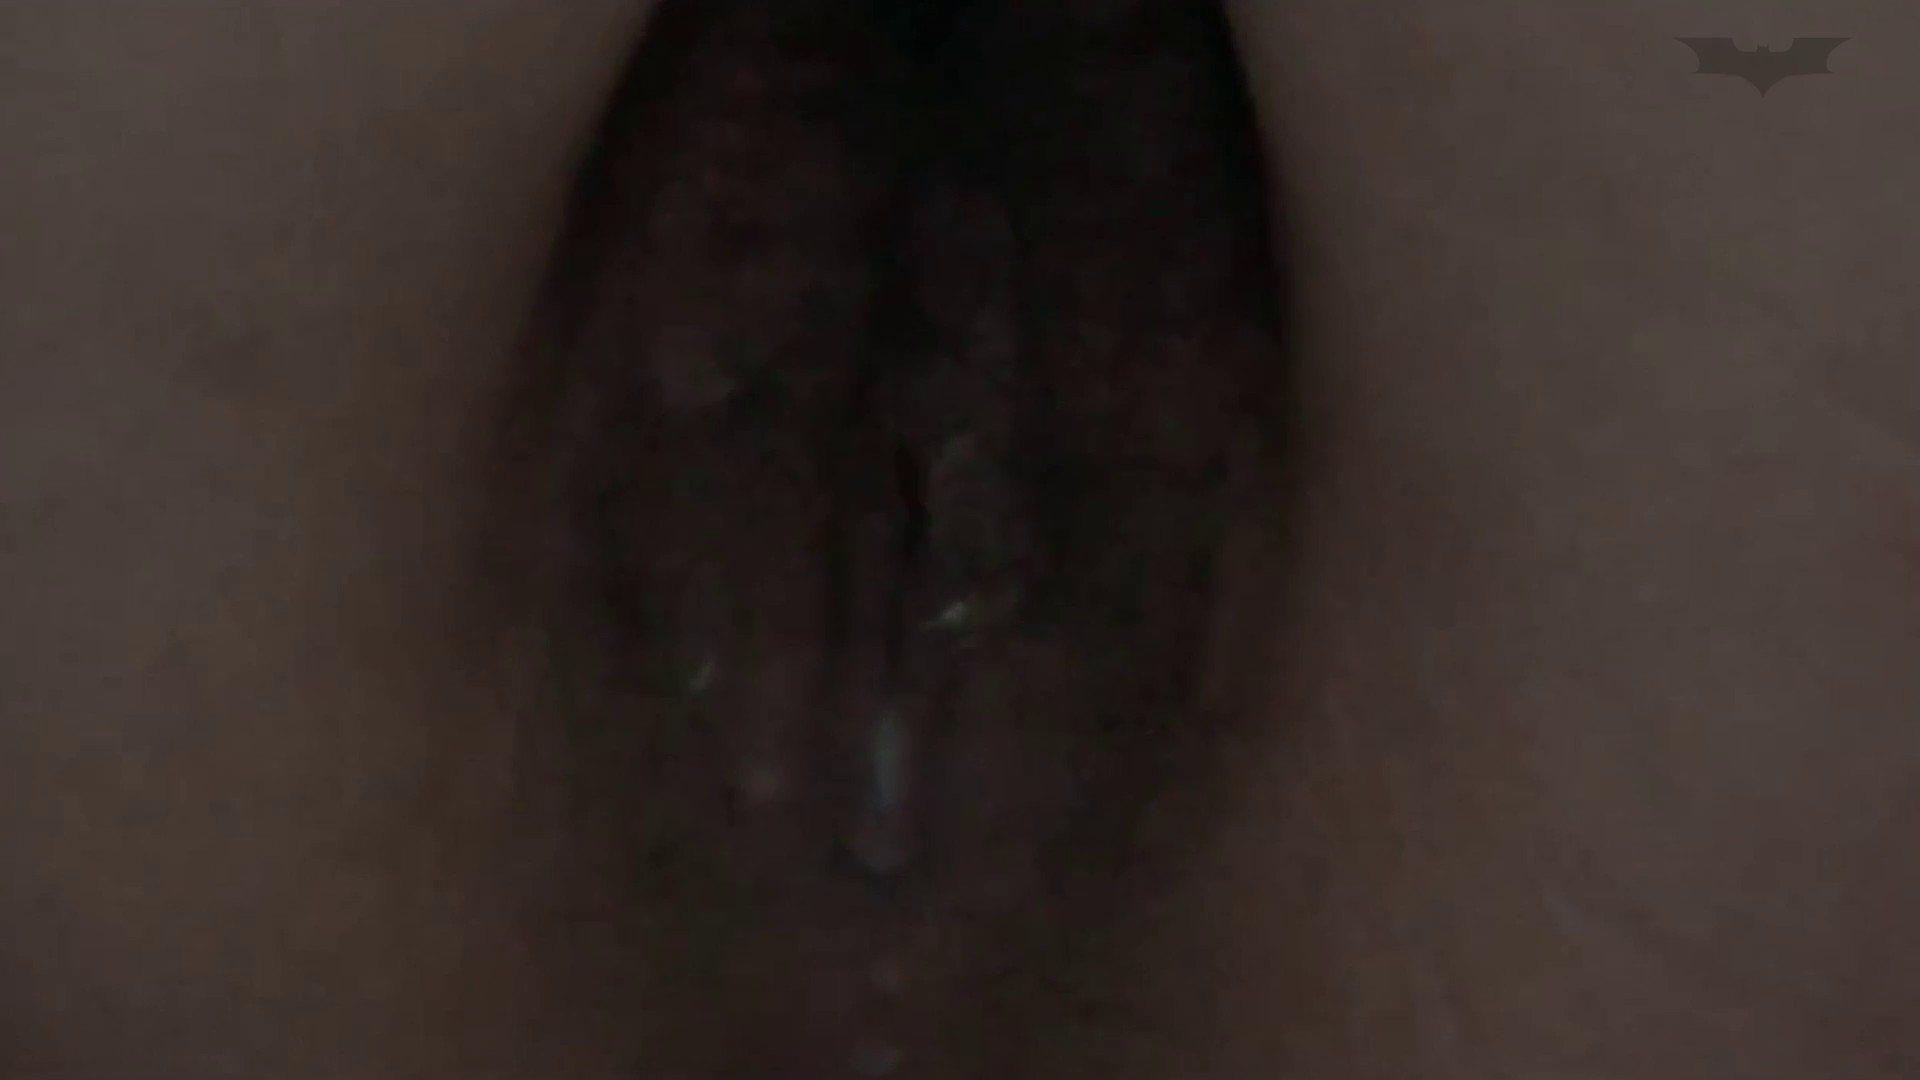 JD盗撮 美女の洗面所の秘密 Vol.65 丸見え 性交動画流出 89画像 72